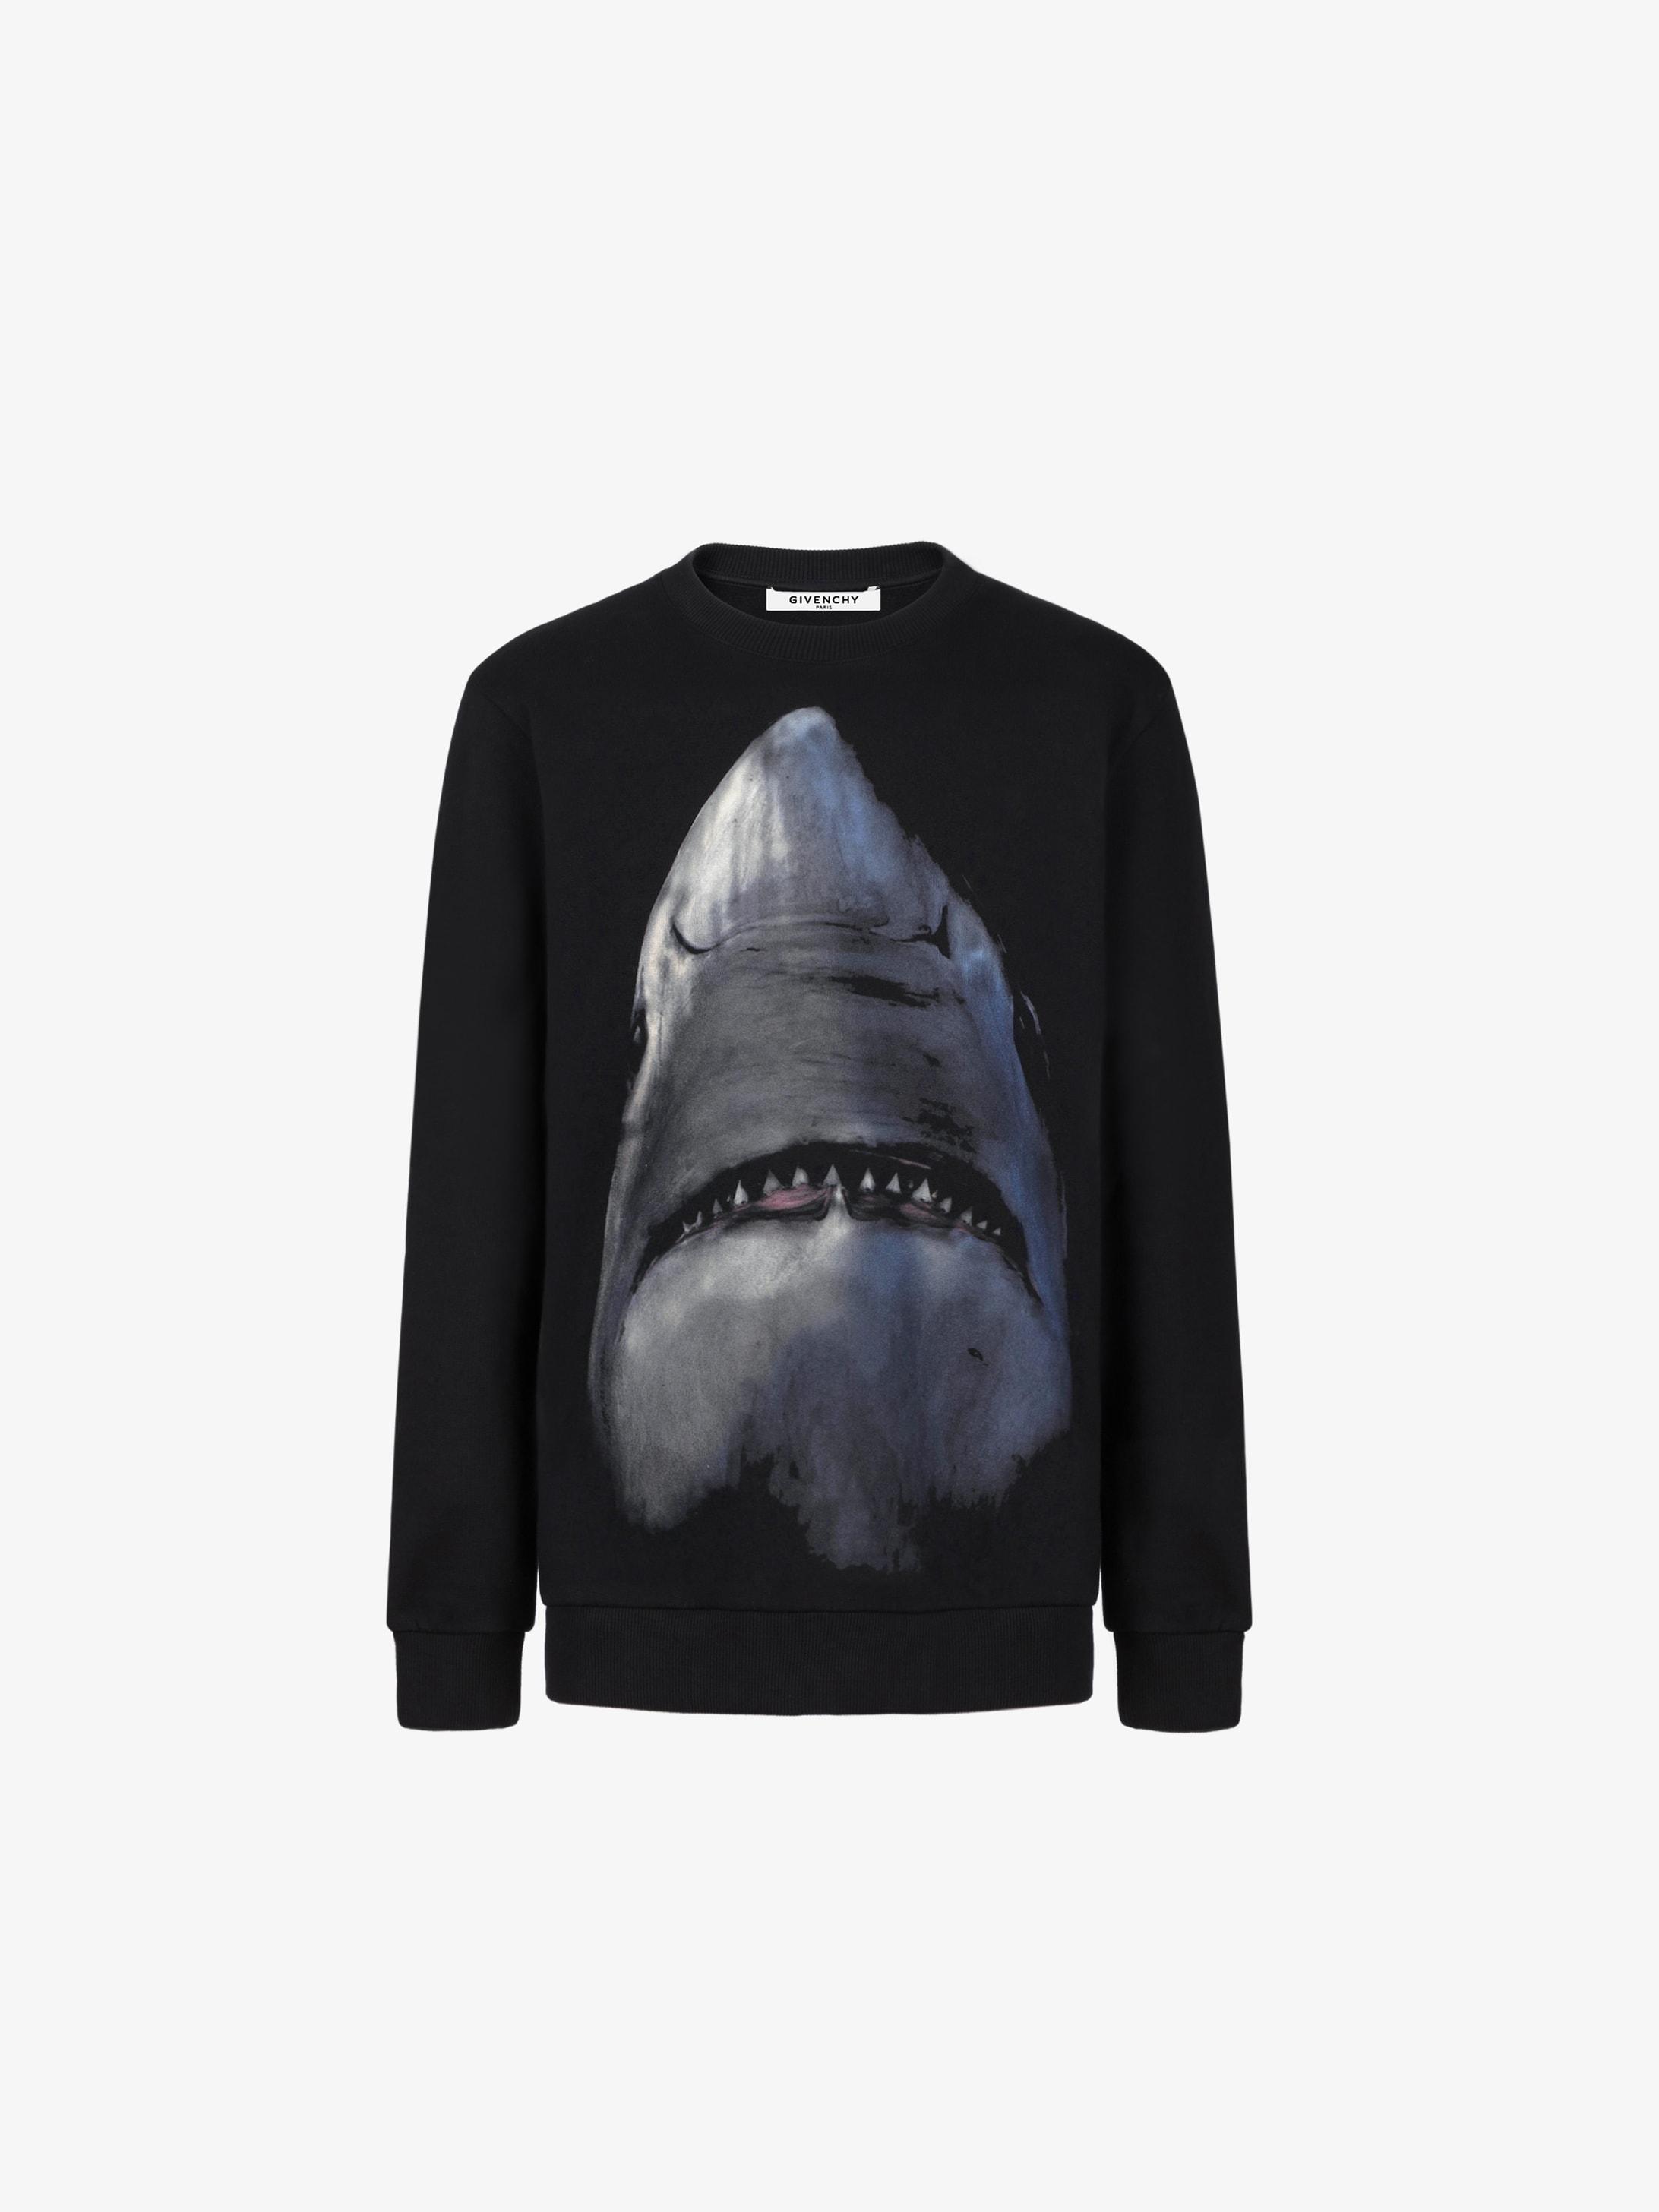 Shark printed sweatshirt